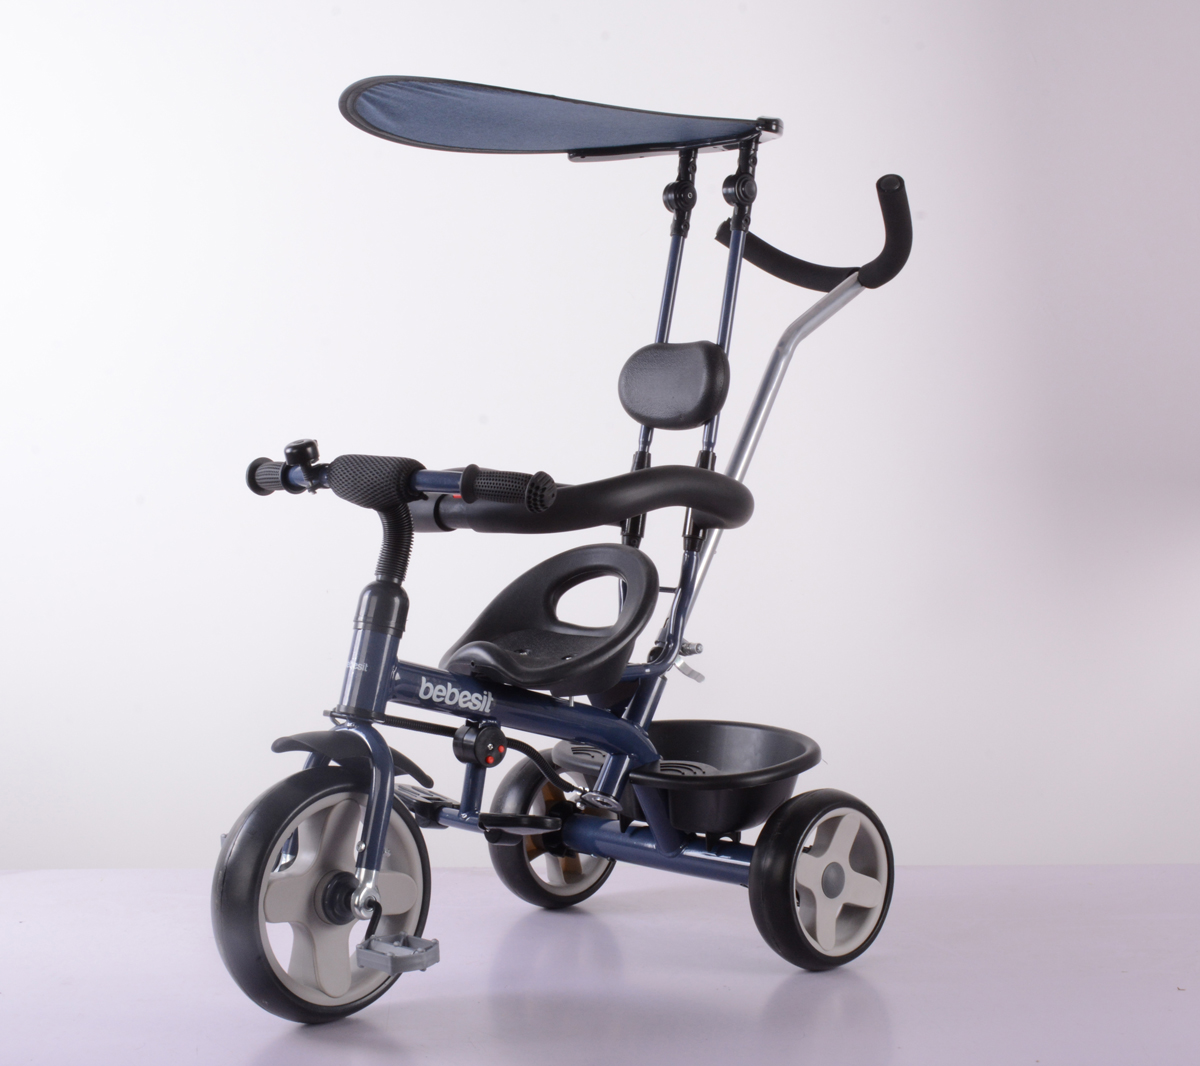 BEBESIT Triciclo con Capota Azul